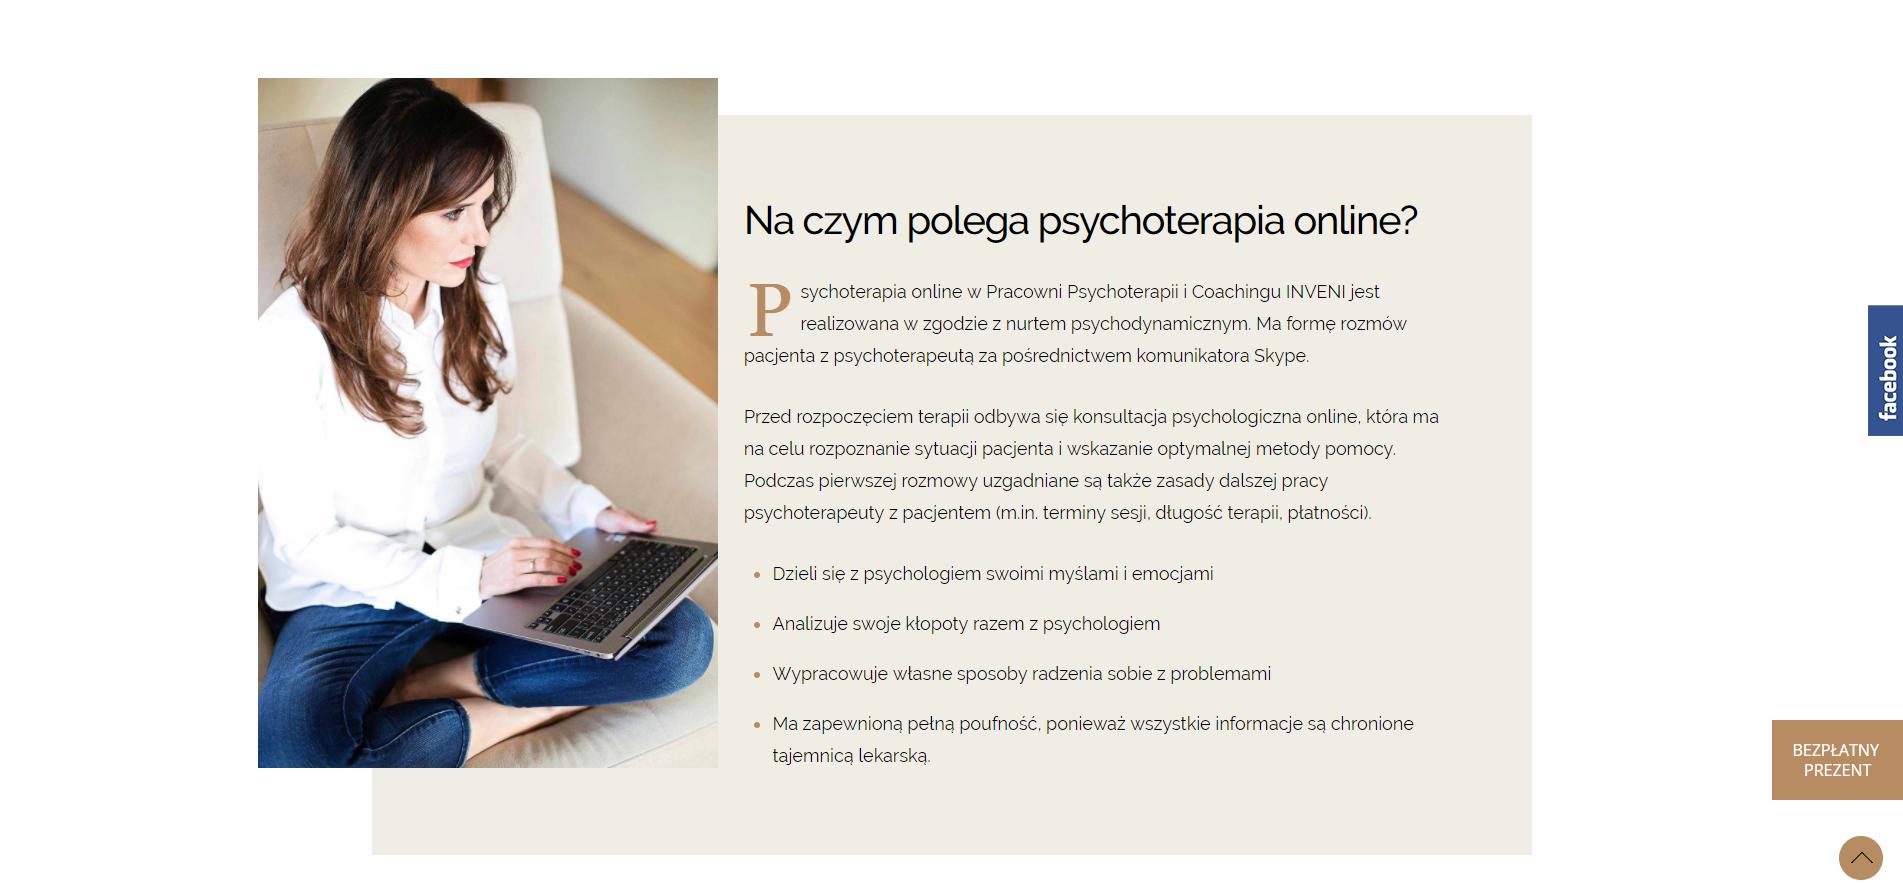 Psychoterapia online Konsultacja psychologiczna online INVENI